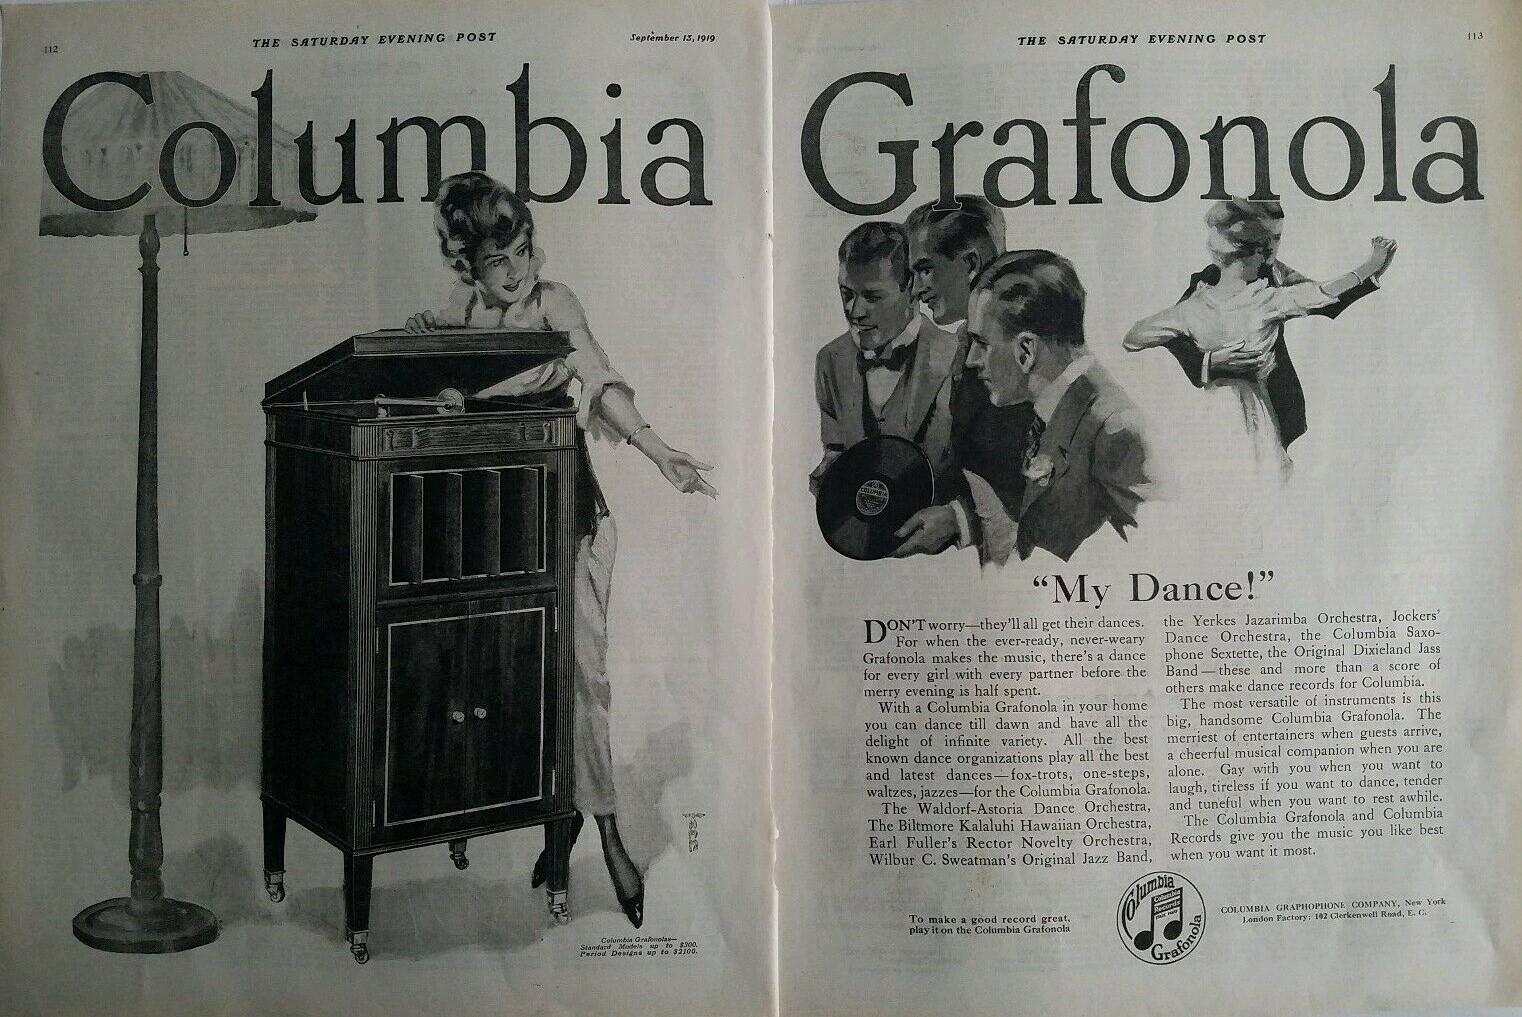 1919 Columbia Grafonola